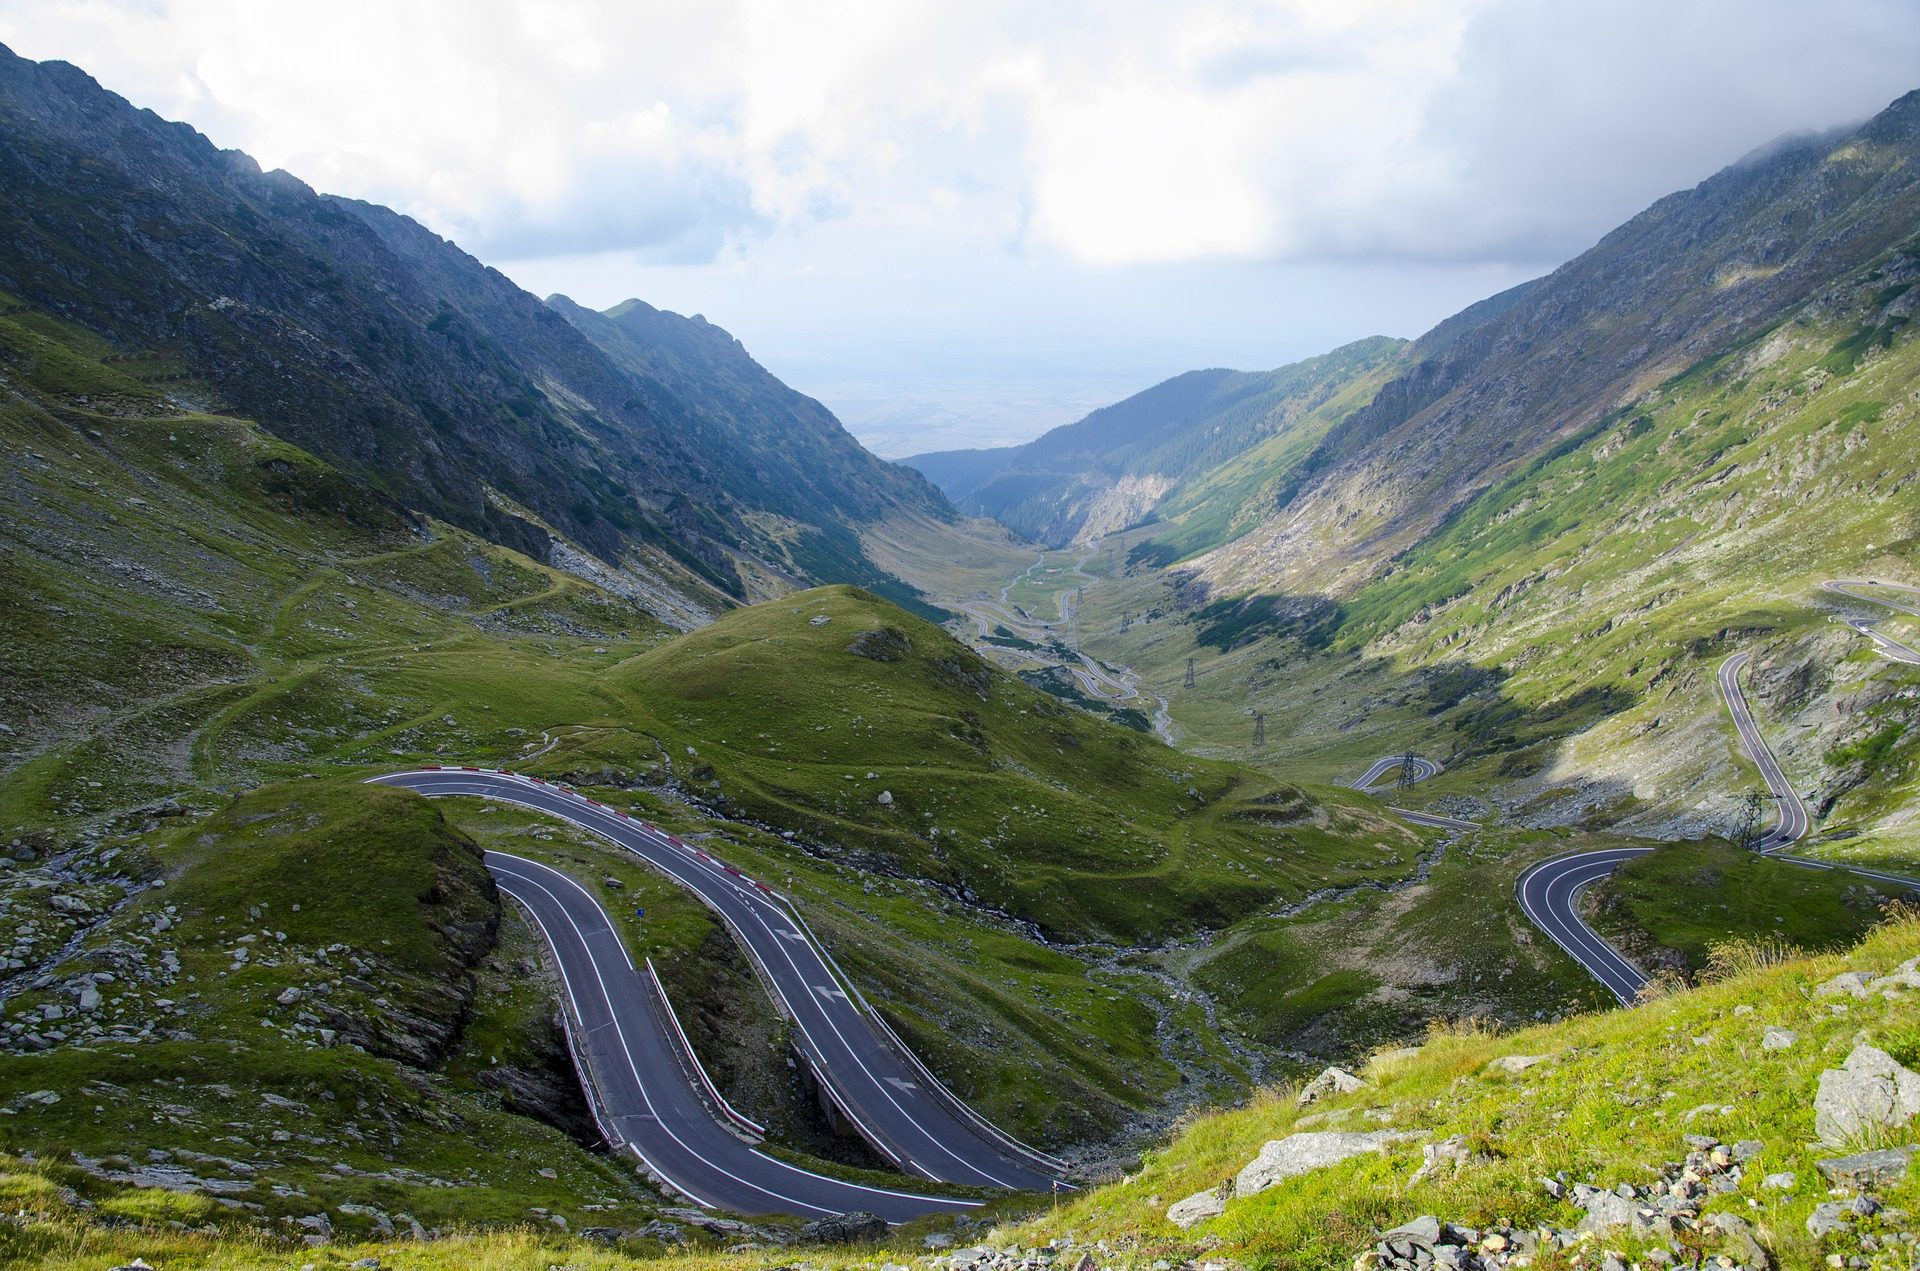 montagnes, carretera, courbes, viaje, voyage, cRoute- Fonds d'écran HD - Professor-falken.com